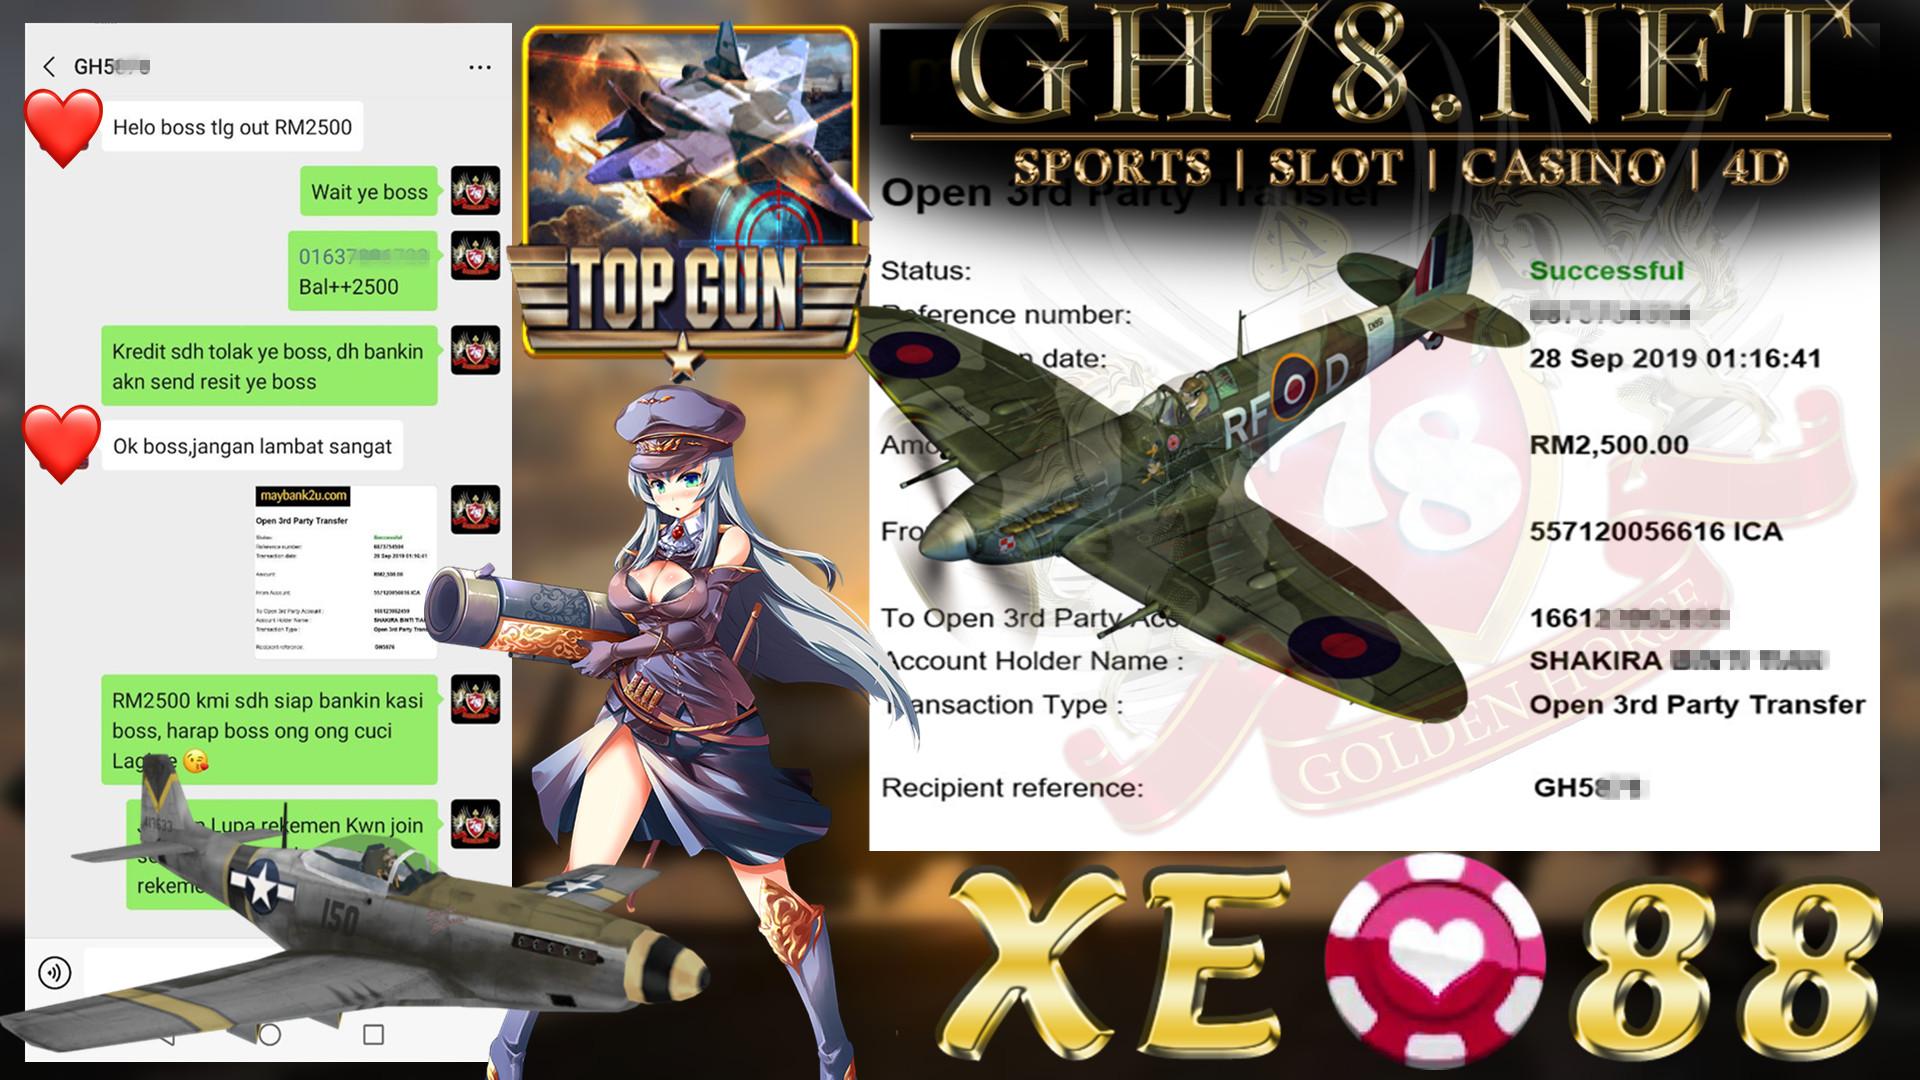 MEMBER MAIN XE88 FT.TOP GUN CUCI RM2500 ~~